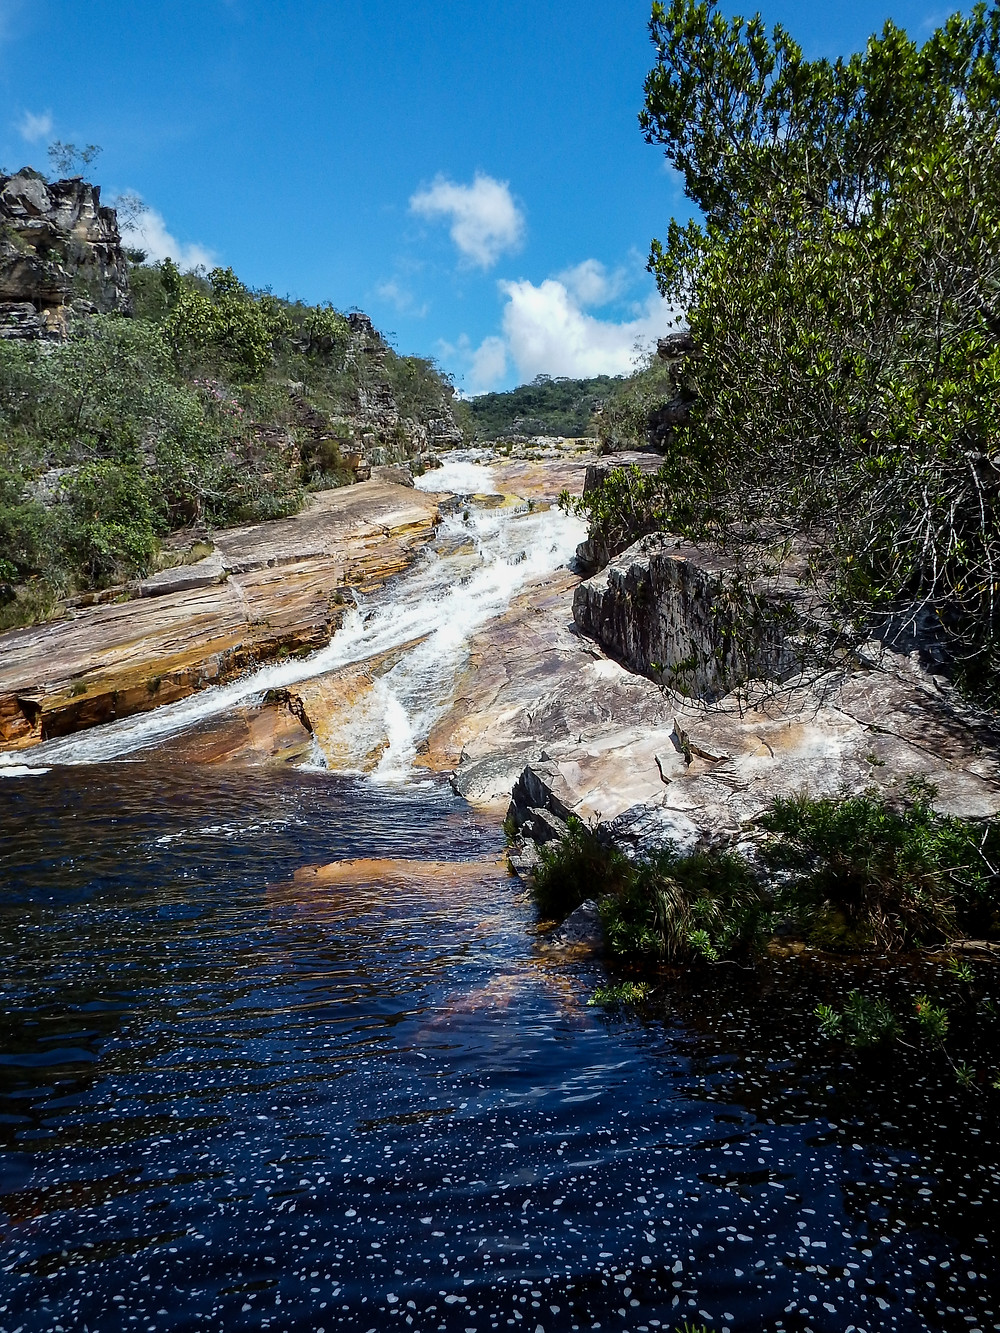 Parque Estadual do Rio Preto